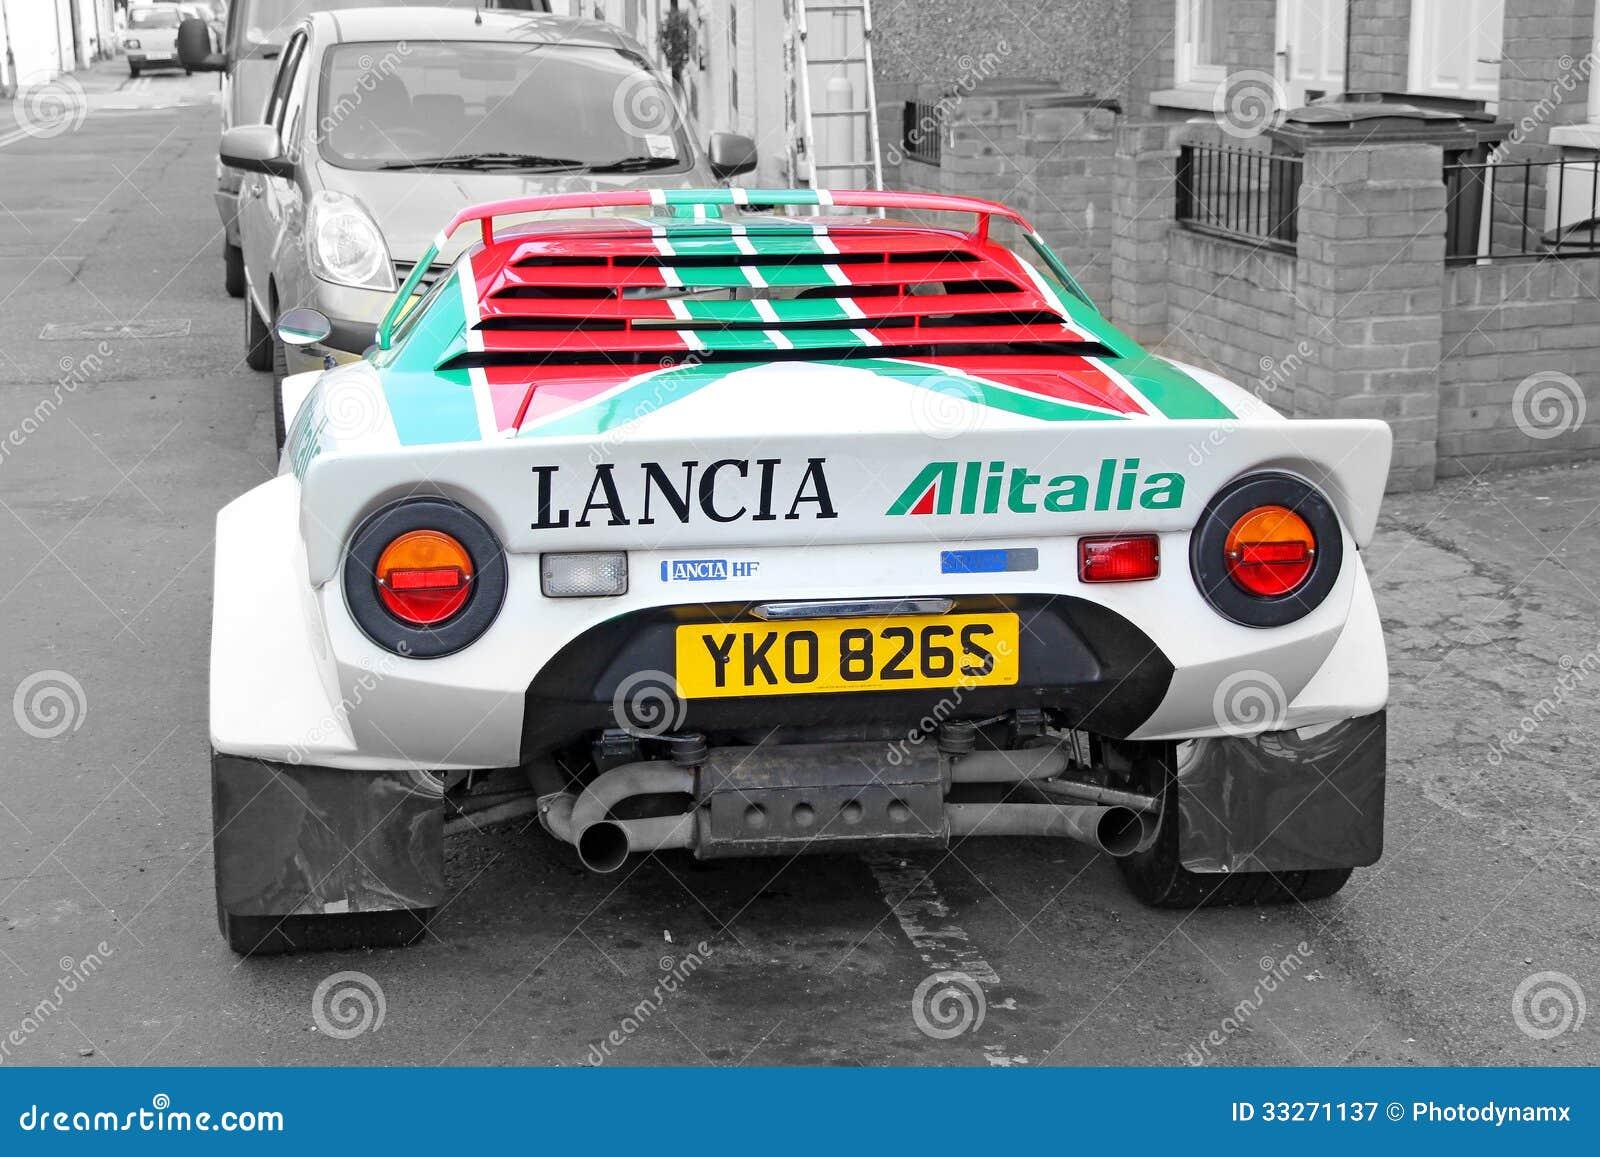 lancia sponsored racing car editorial photography image 33271137. Black Bedroom Furniture Sets. Home Design Ideas